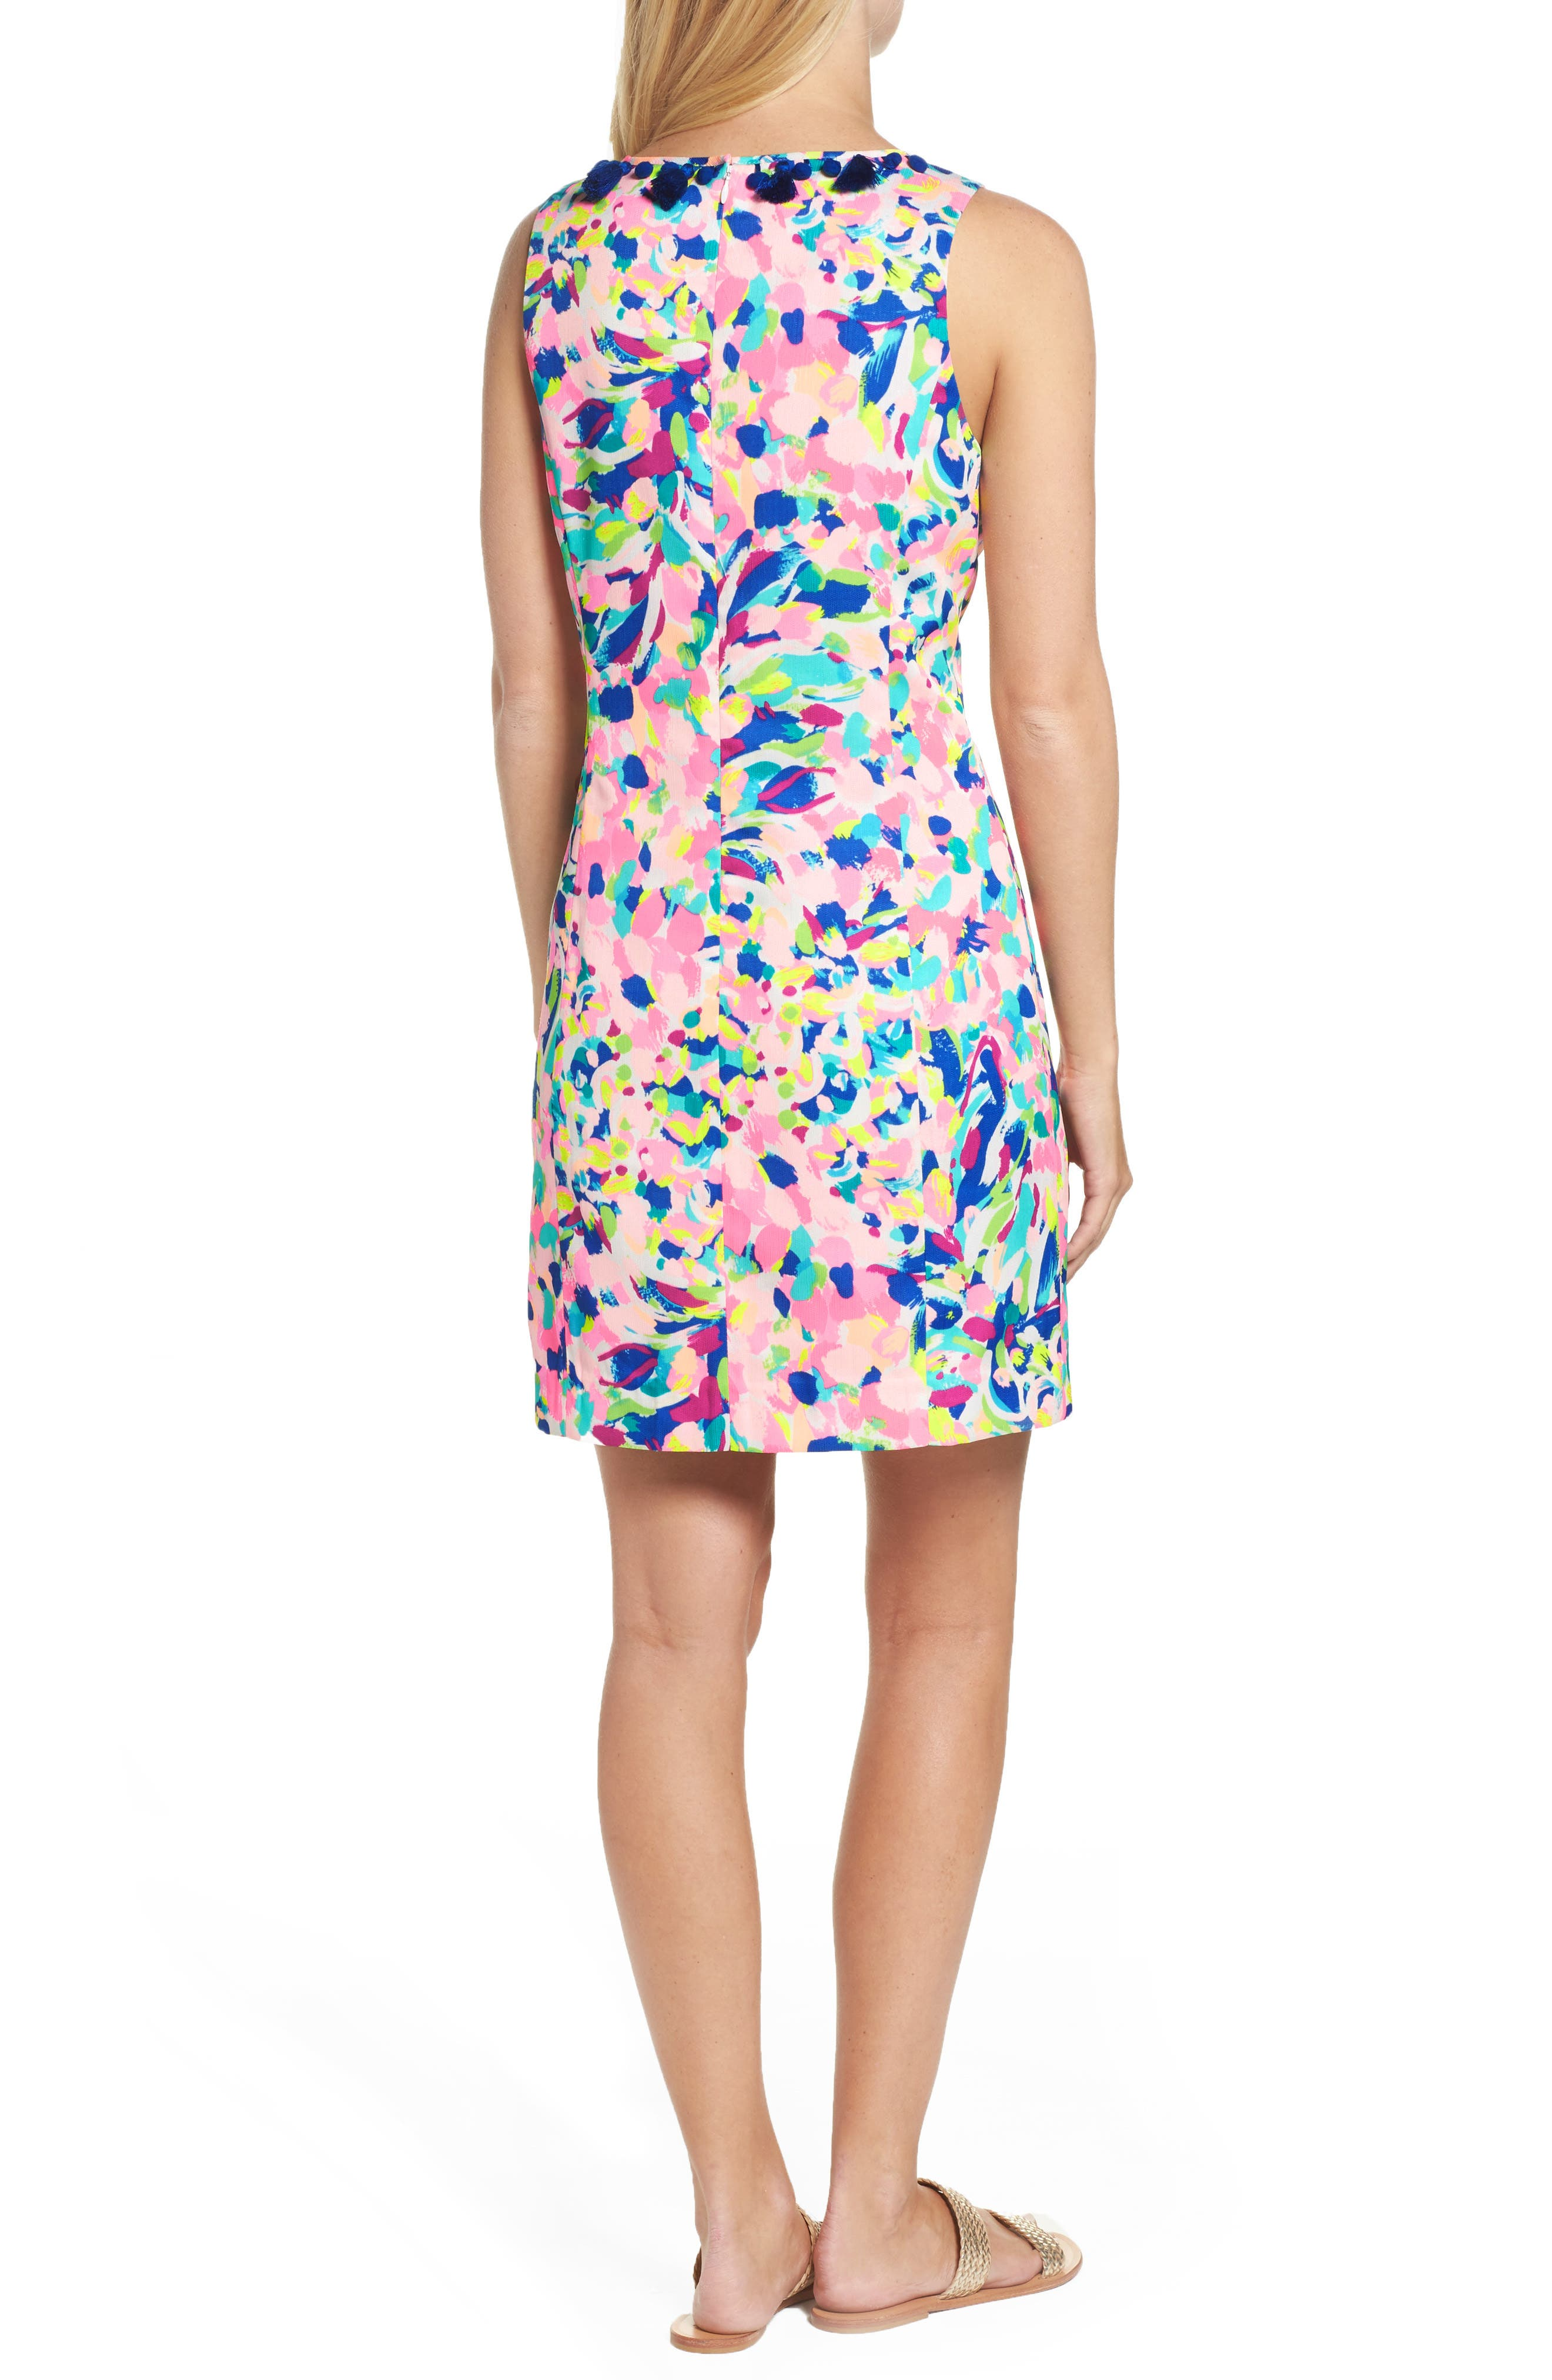 Cabrey Sheath Dress,                             Alternate thumbnail 2, color,                             698